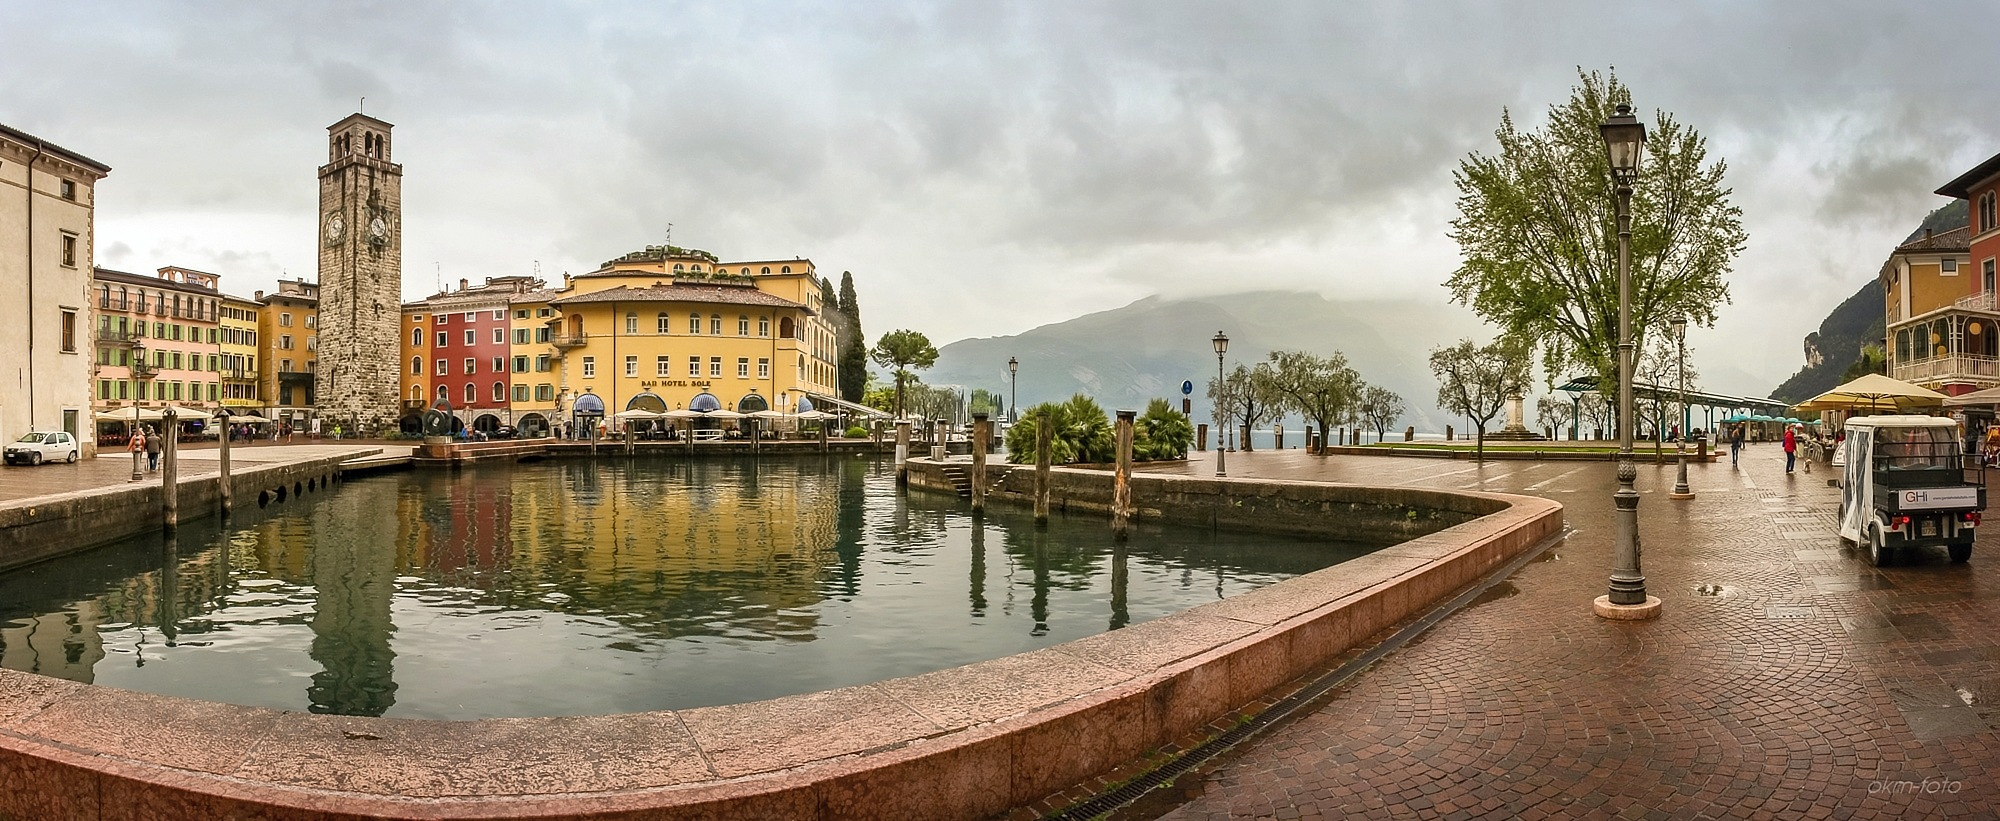 Reiff / Riva del Garda by Oleg Muehlberger